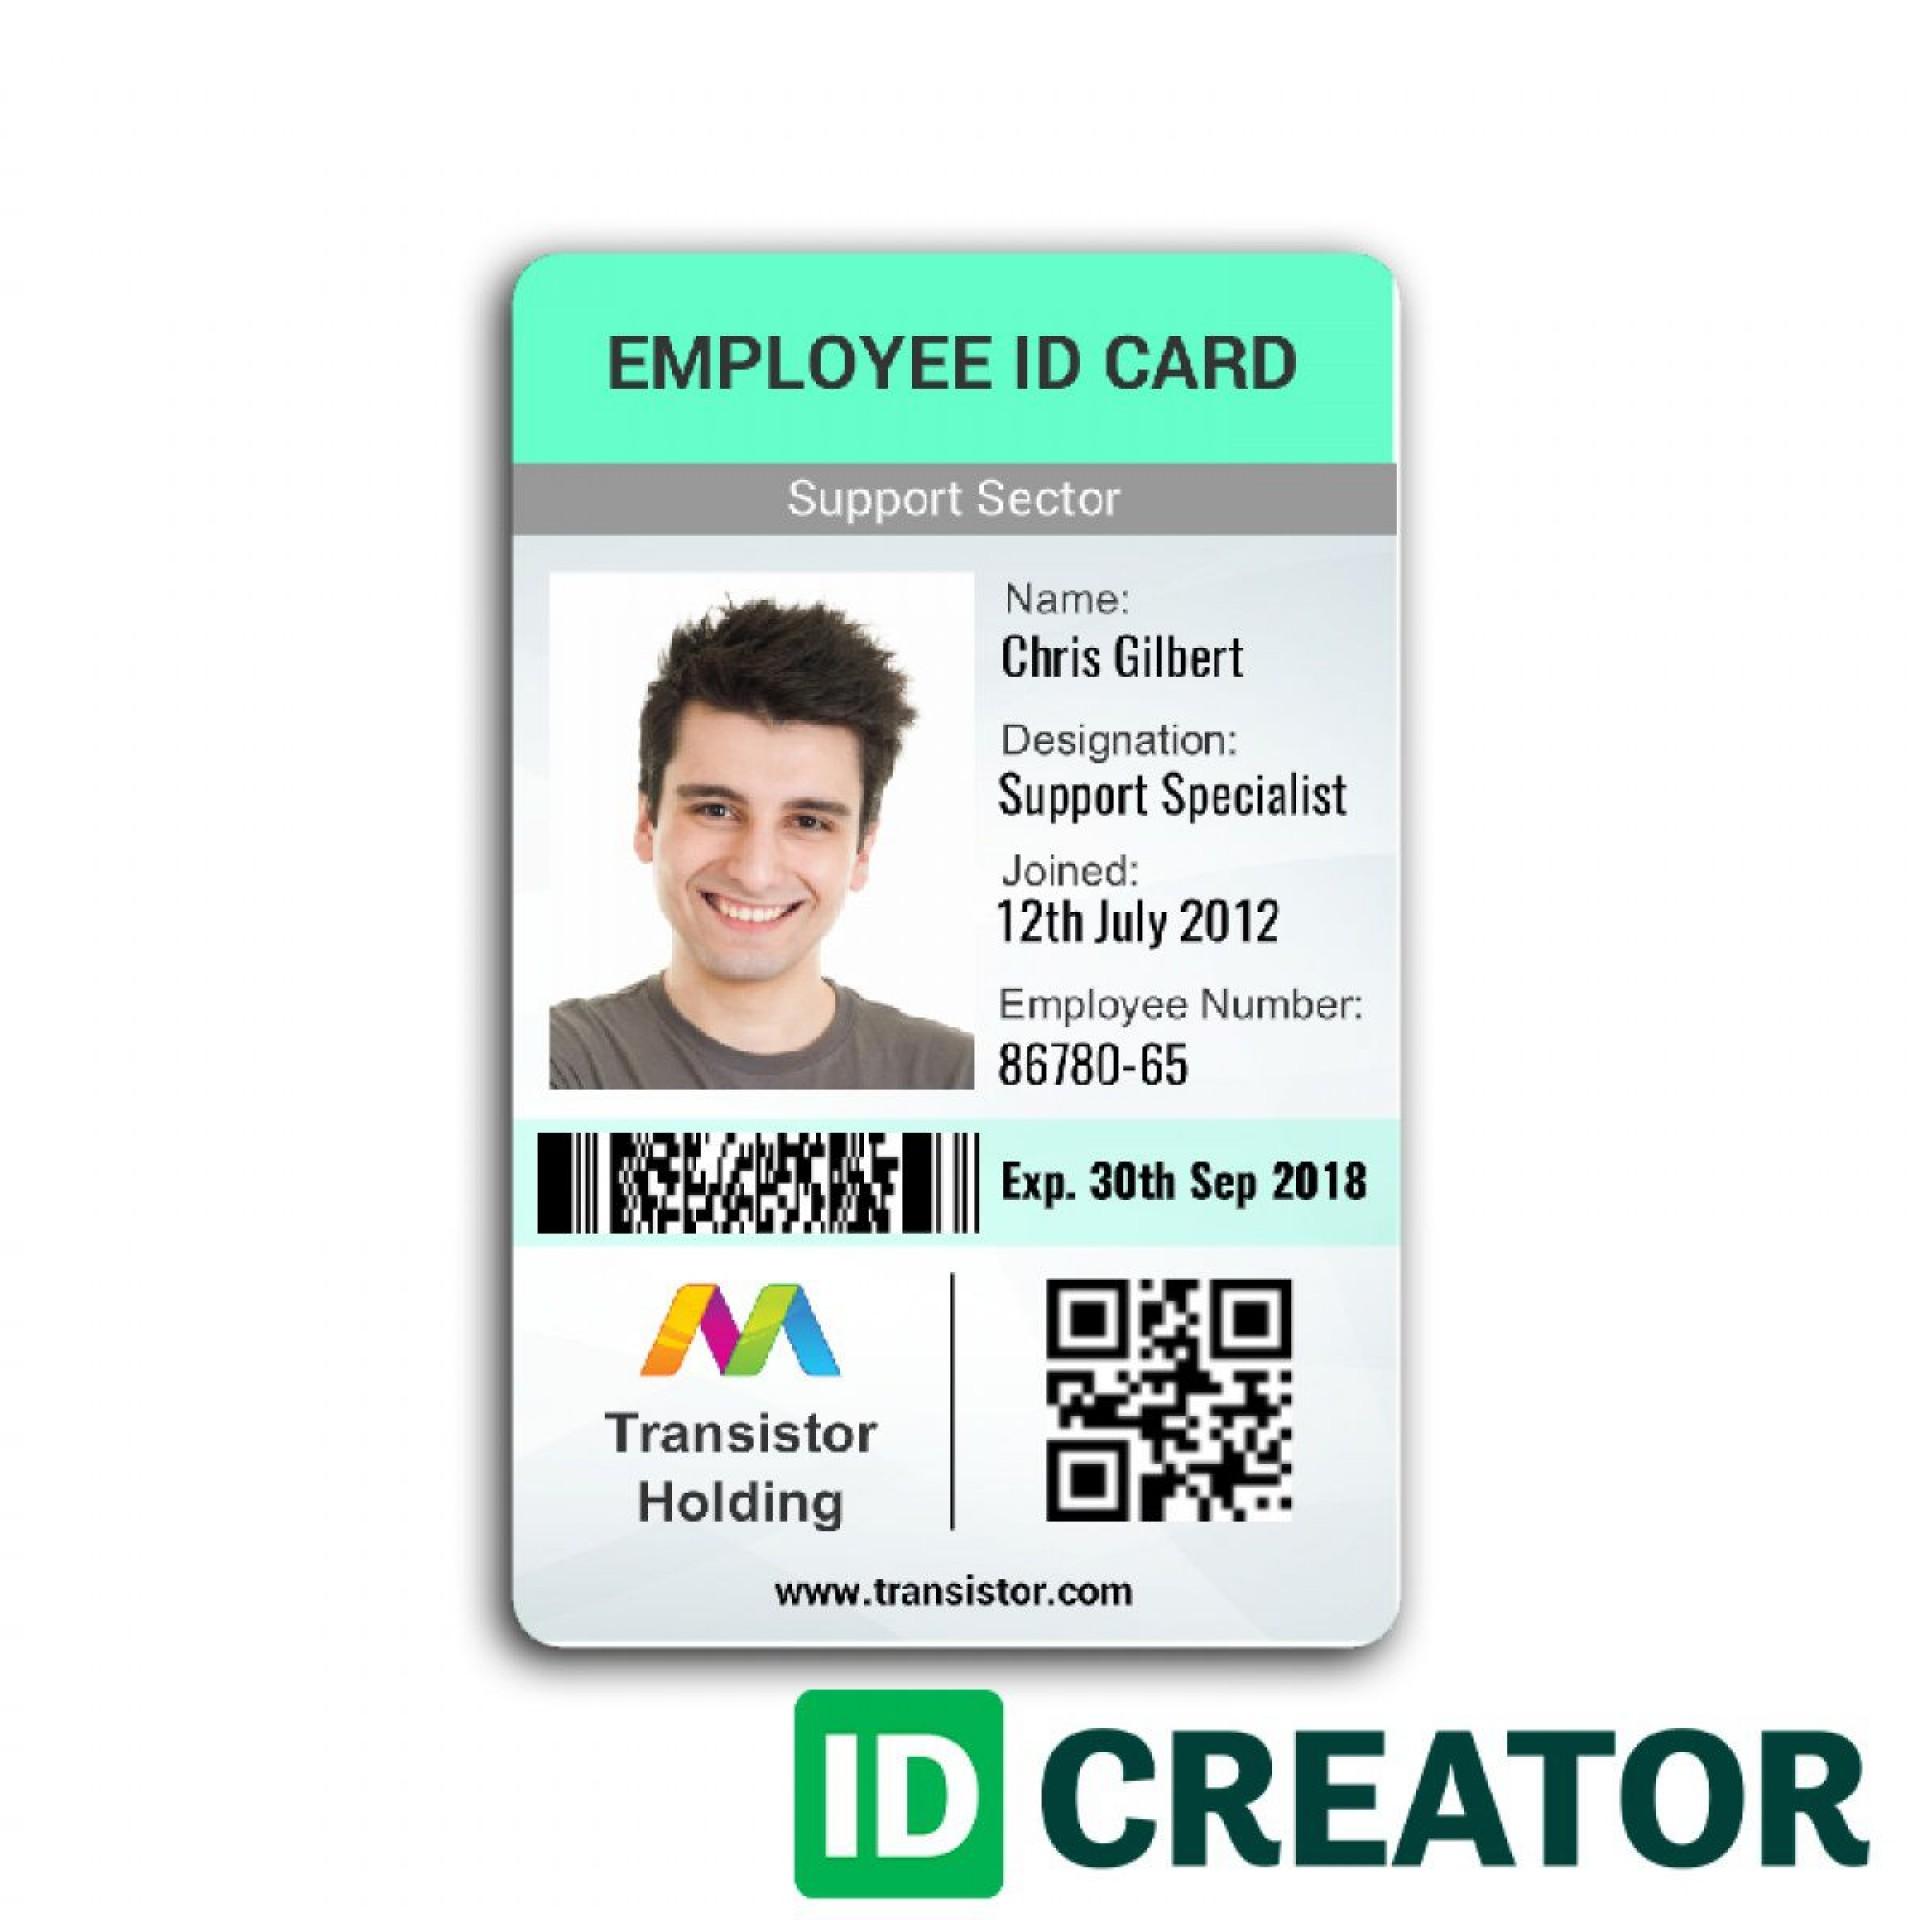 005 Beautiful Id Badge Template Word Image  Free Employee1920